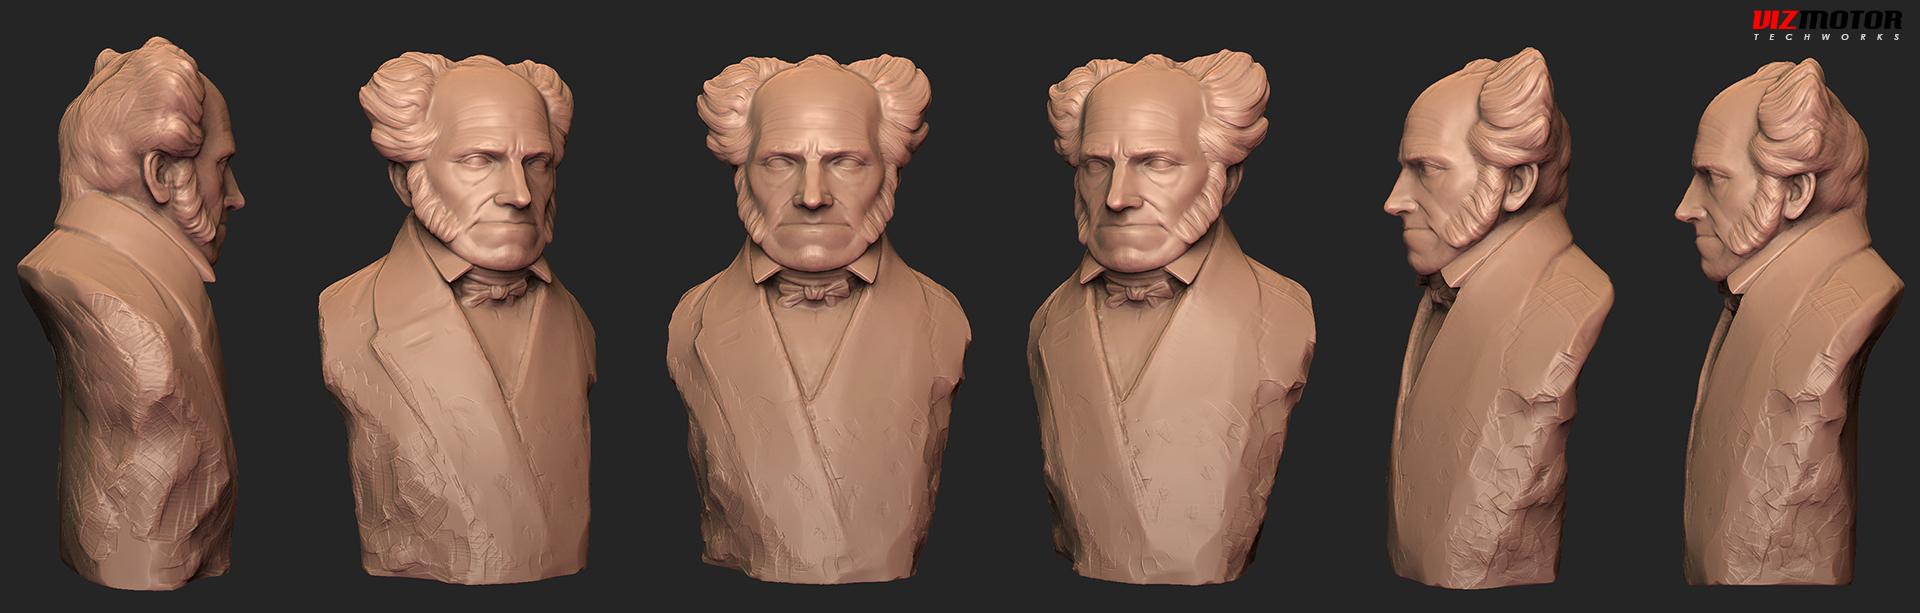 Vizmotor_Shopenhauer